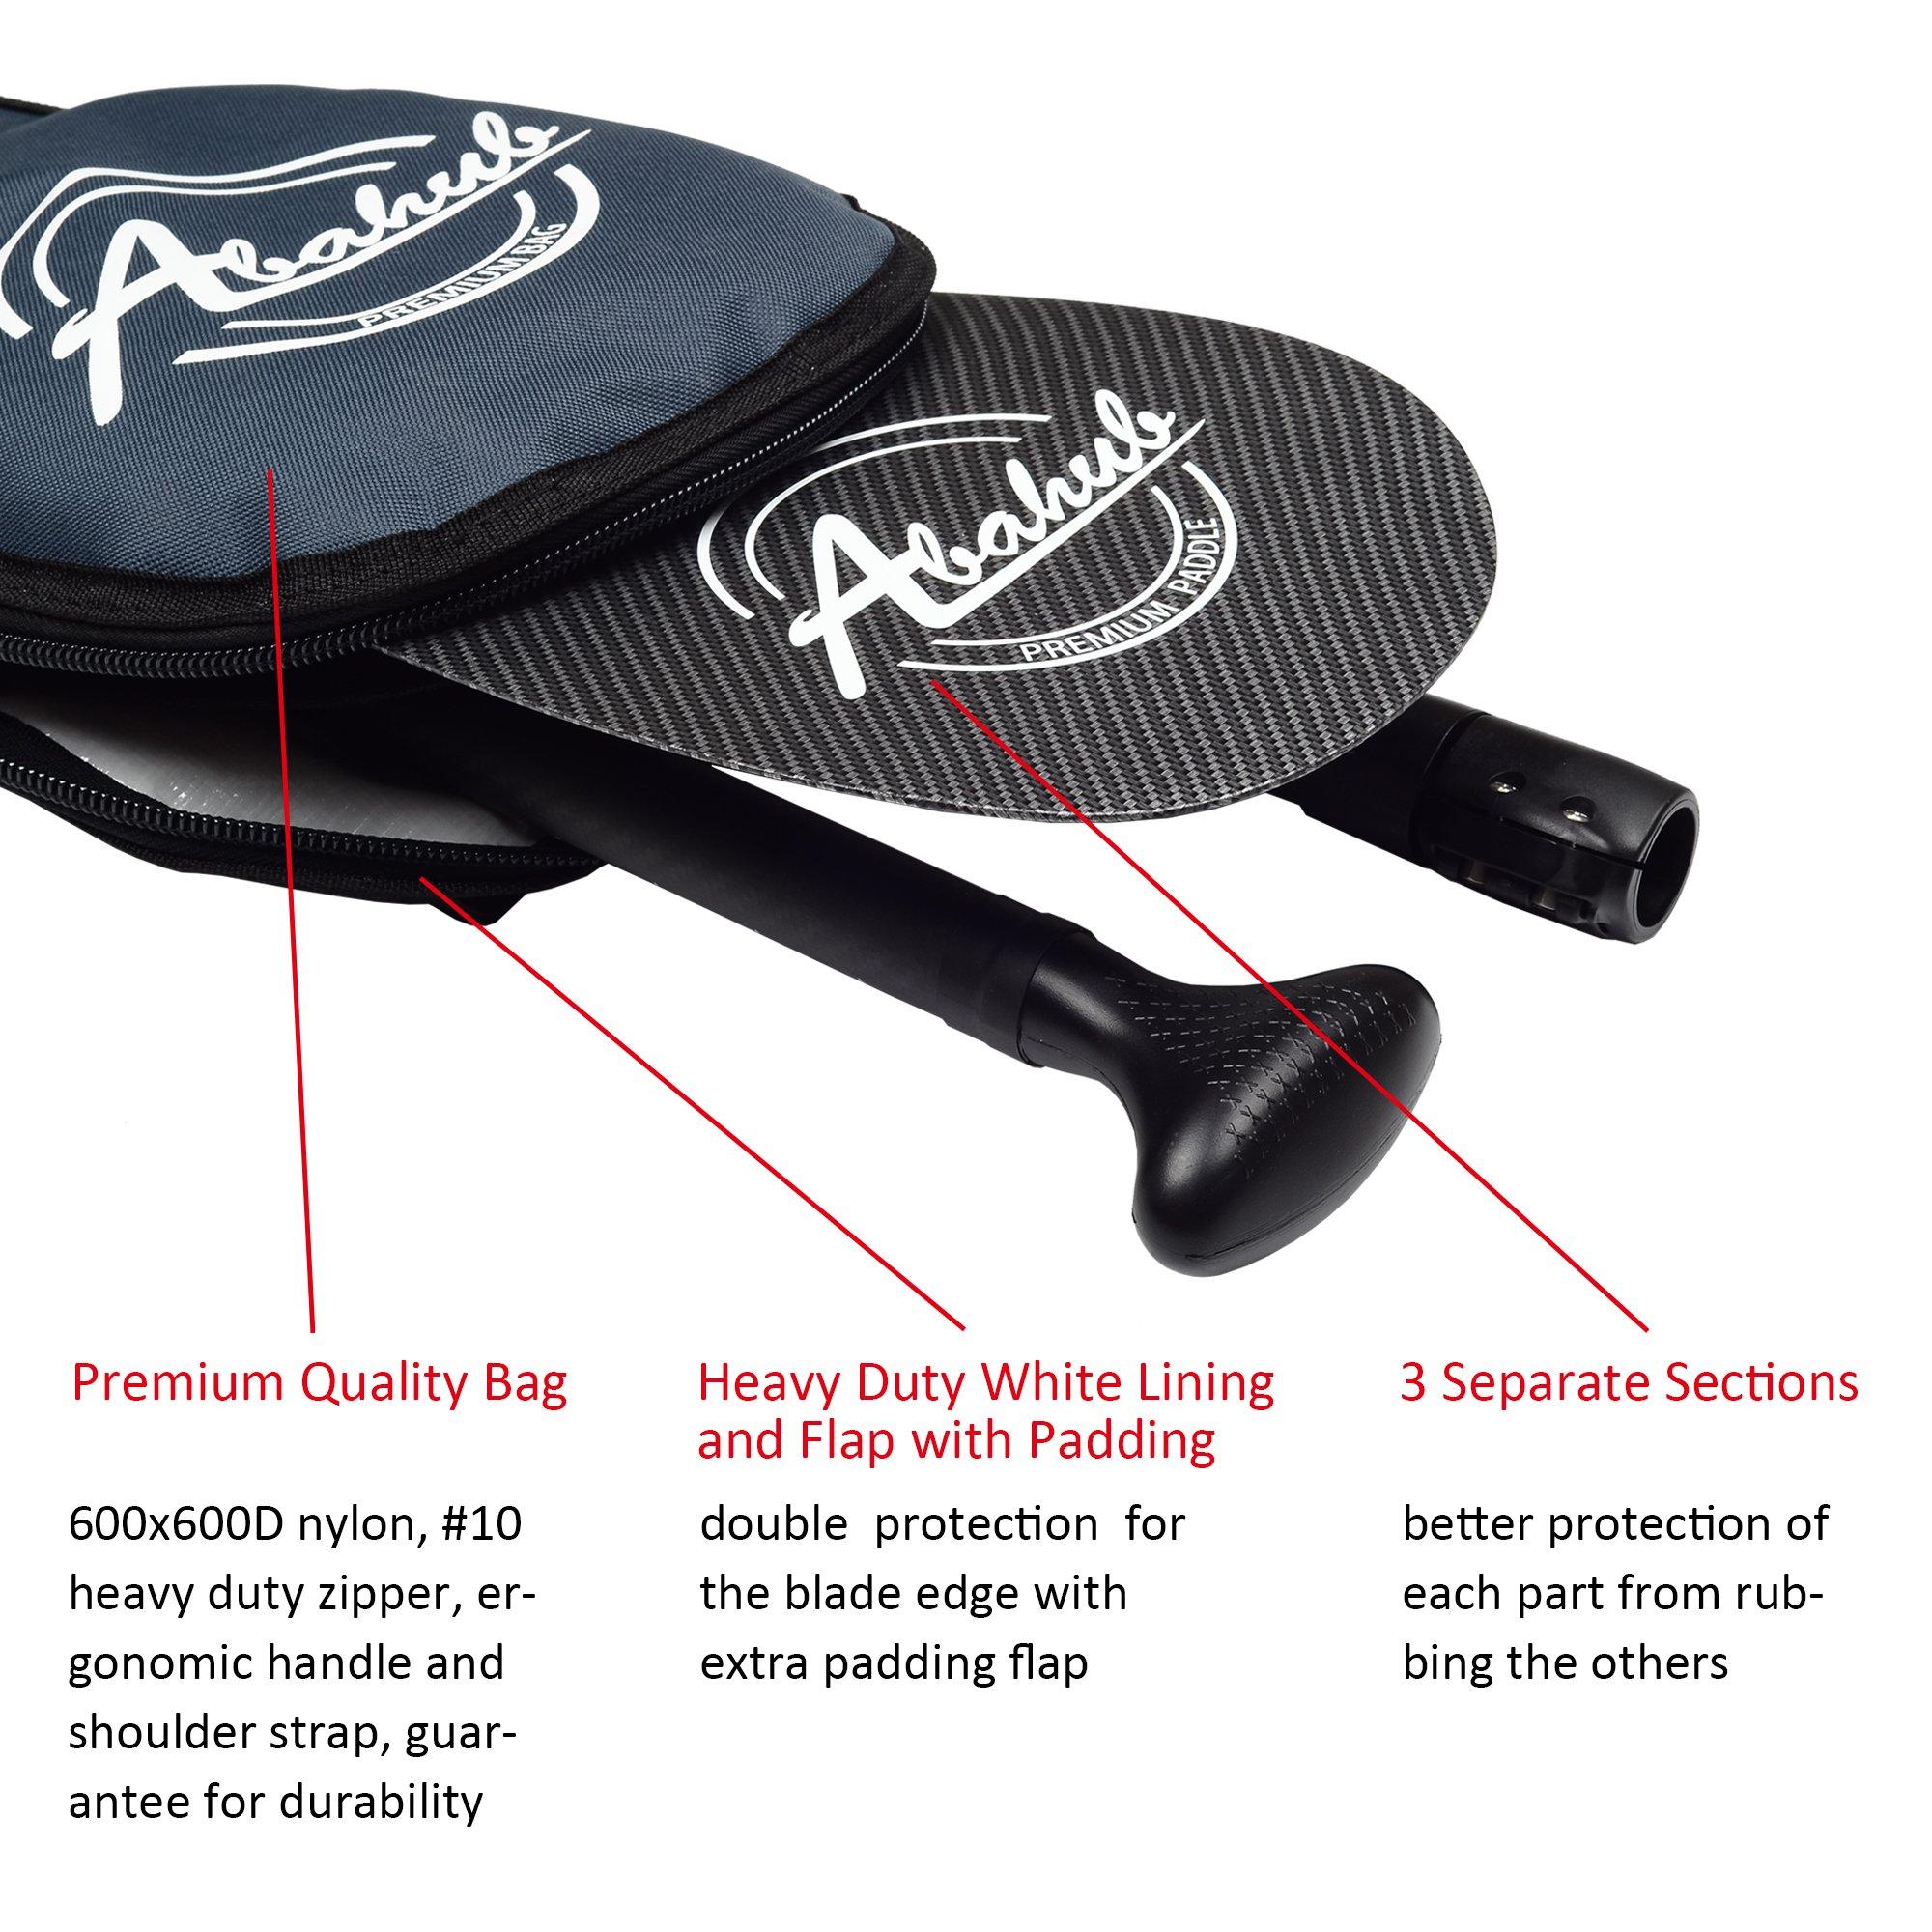 ABAHUB 3-Piece Adjustable Carbon Fiber SUP Paddle Carbon Shaft Carbon Print Plastic Blade + Bag by ABAHUB (Image #7)